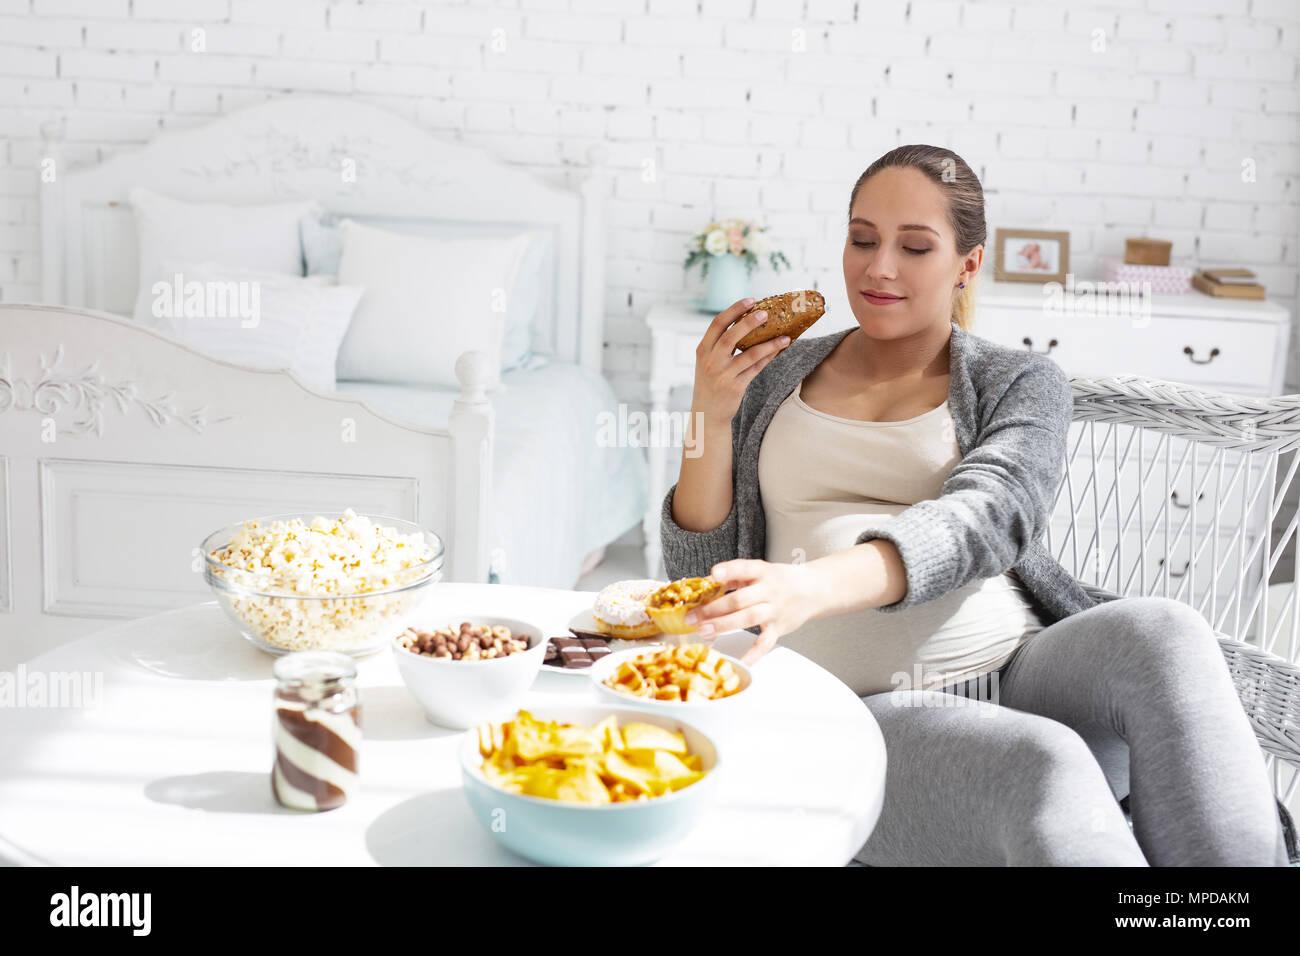 Glad pregnant woman tasting food - Stock Image